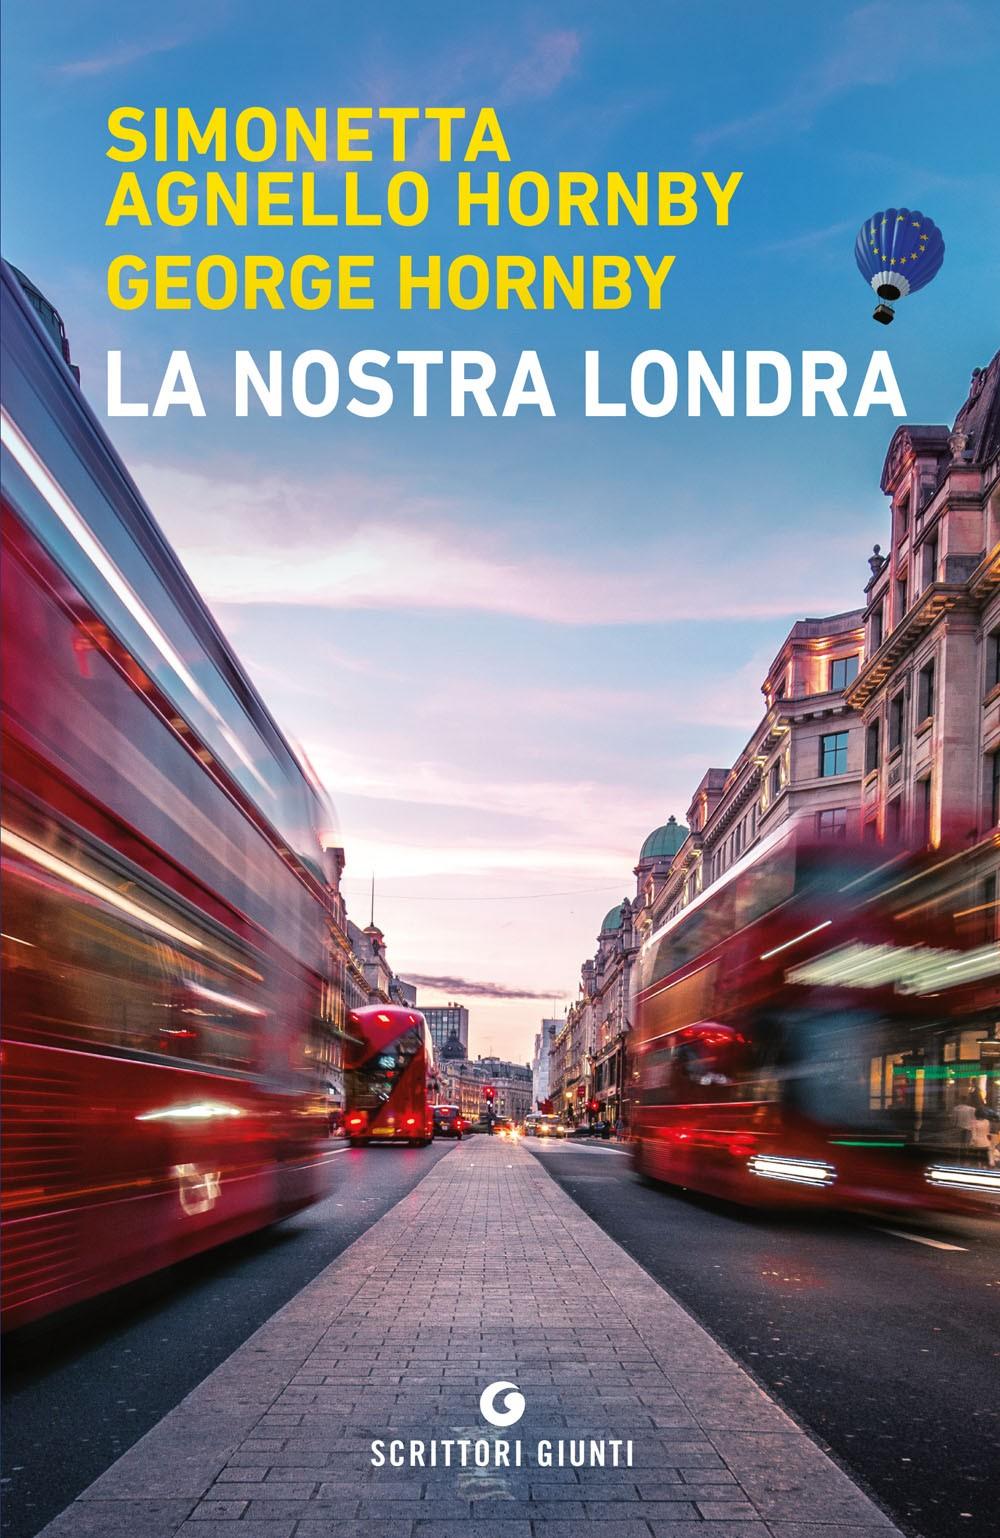 La nostra Londra (Our London)